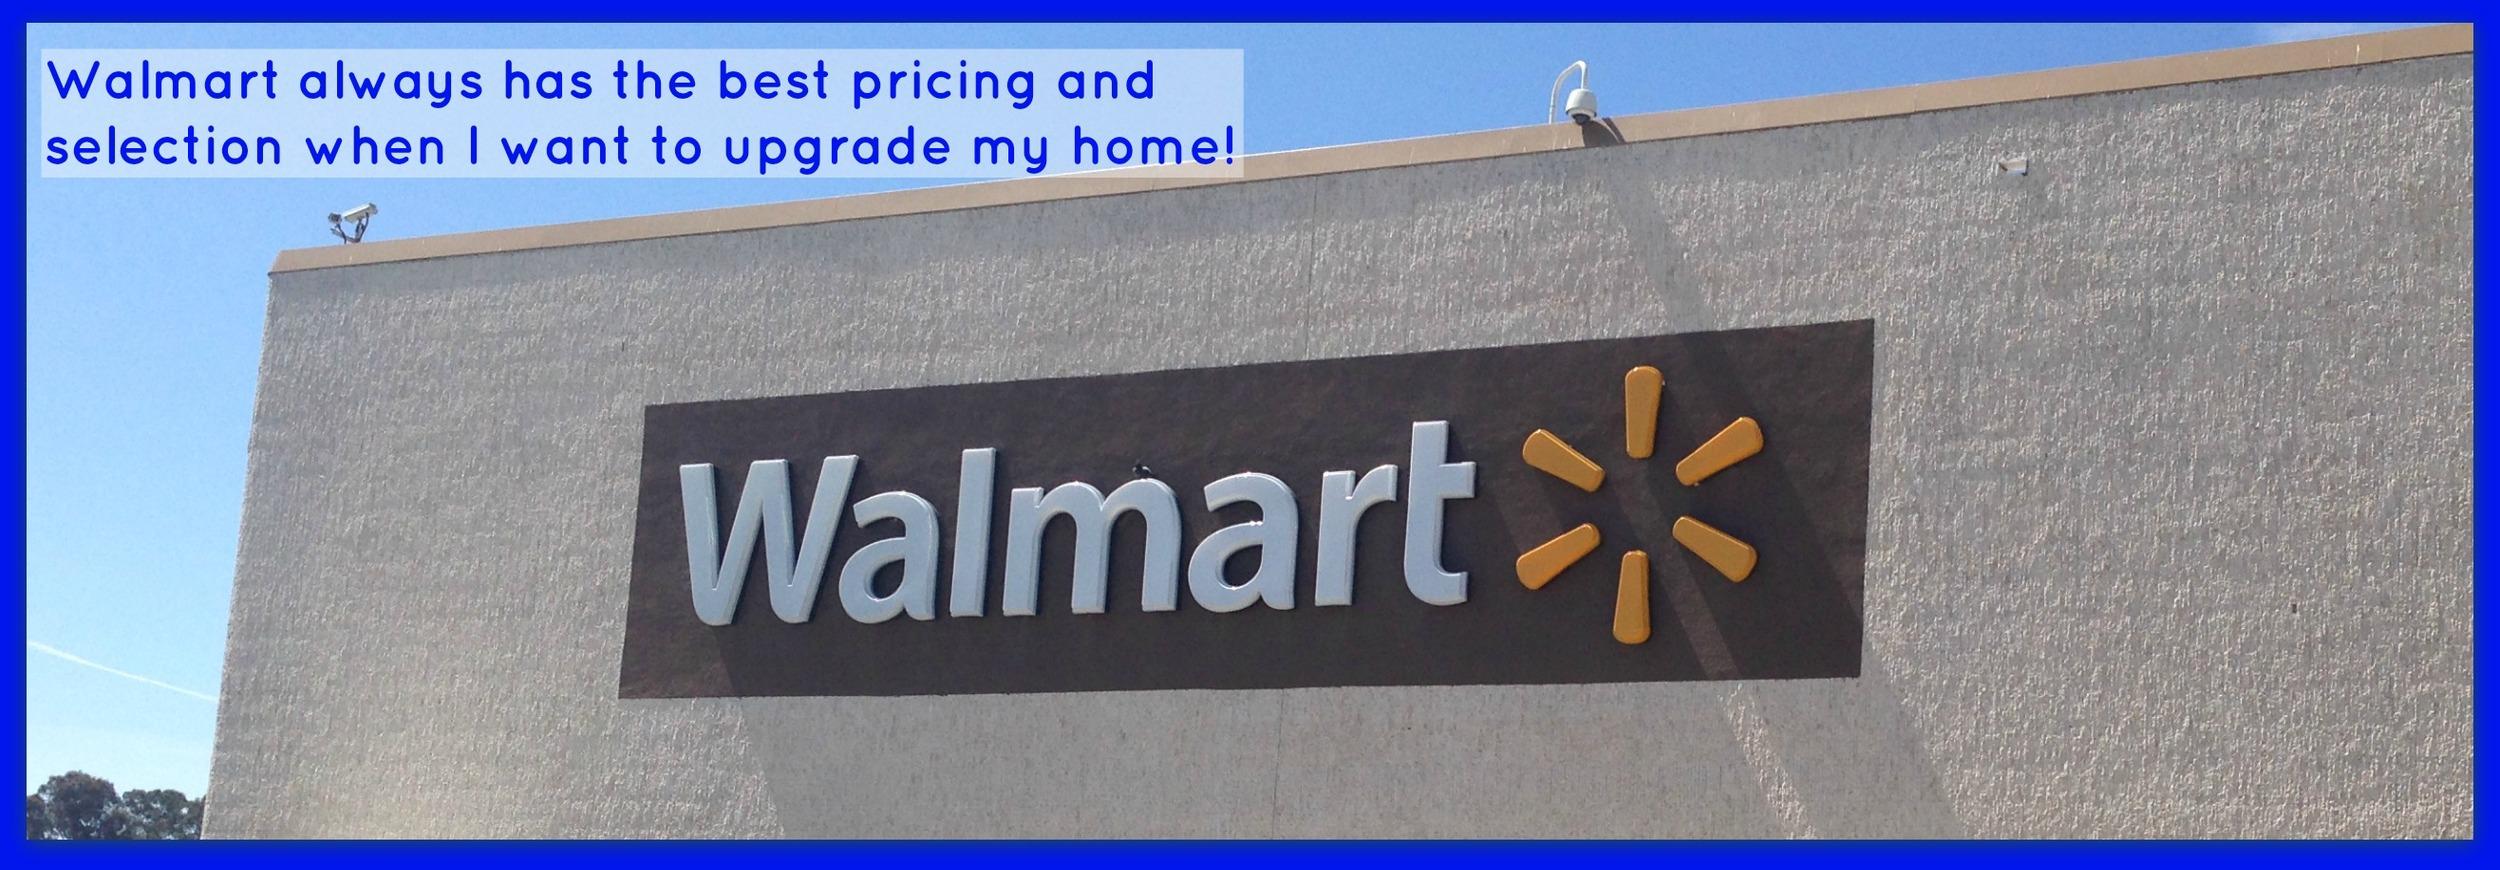 #walmart, #LEDSavings, #CollectiveBias, #cbias, #shop smaller